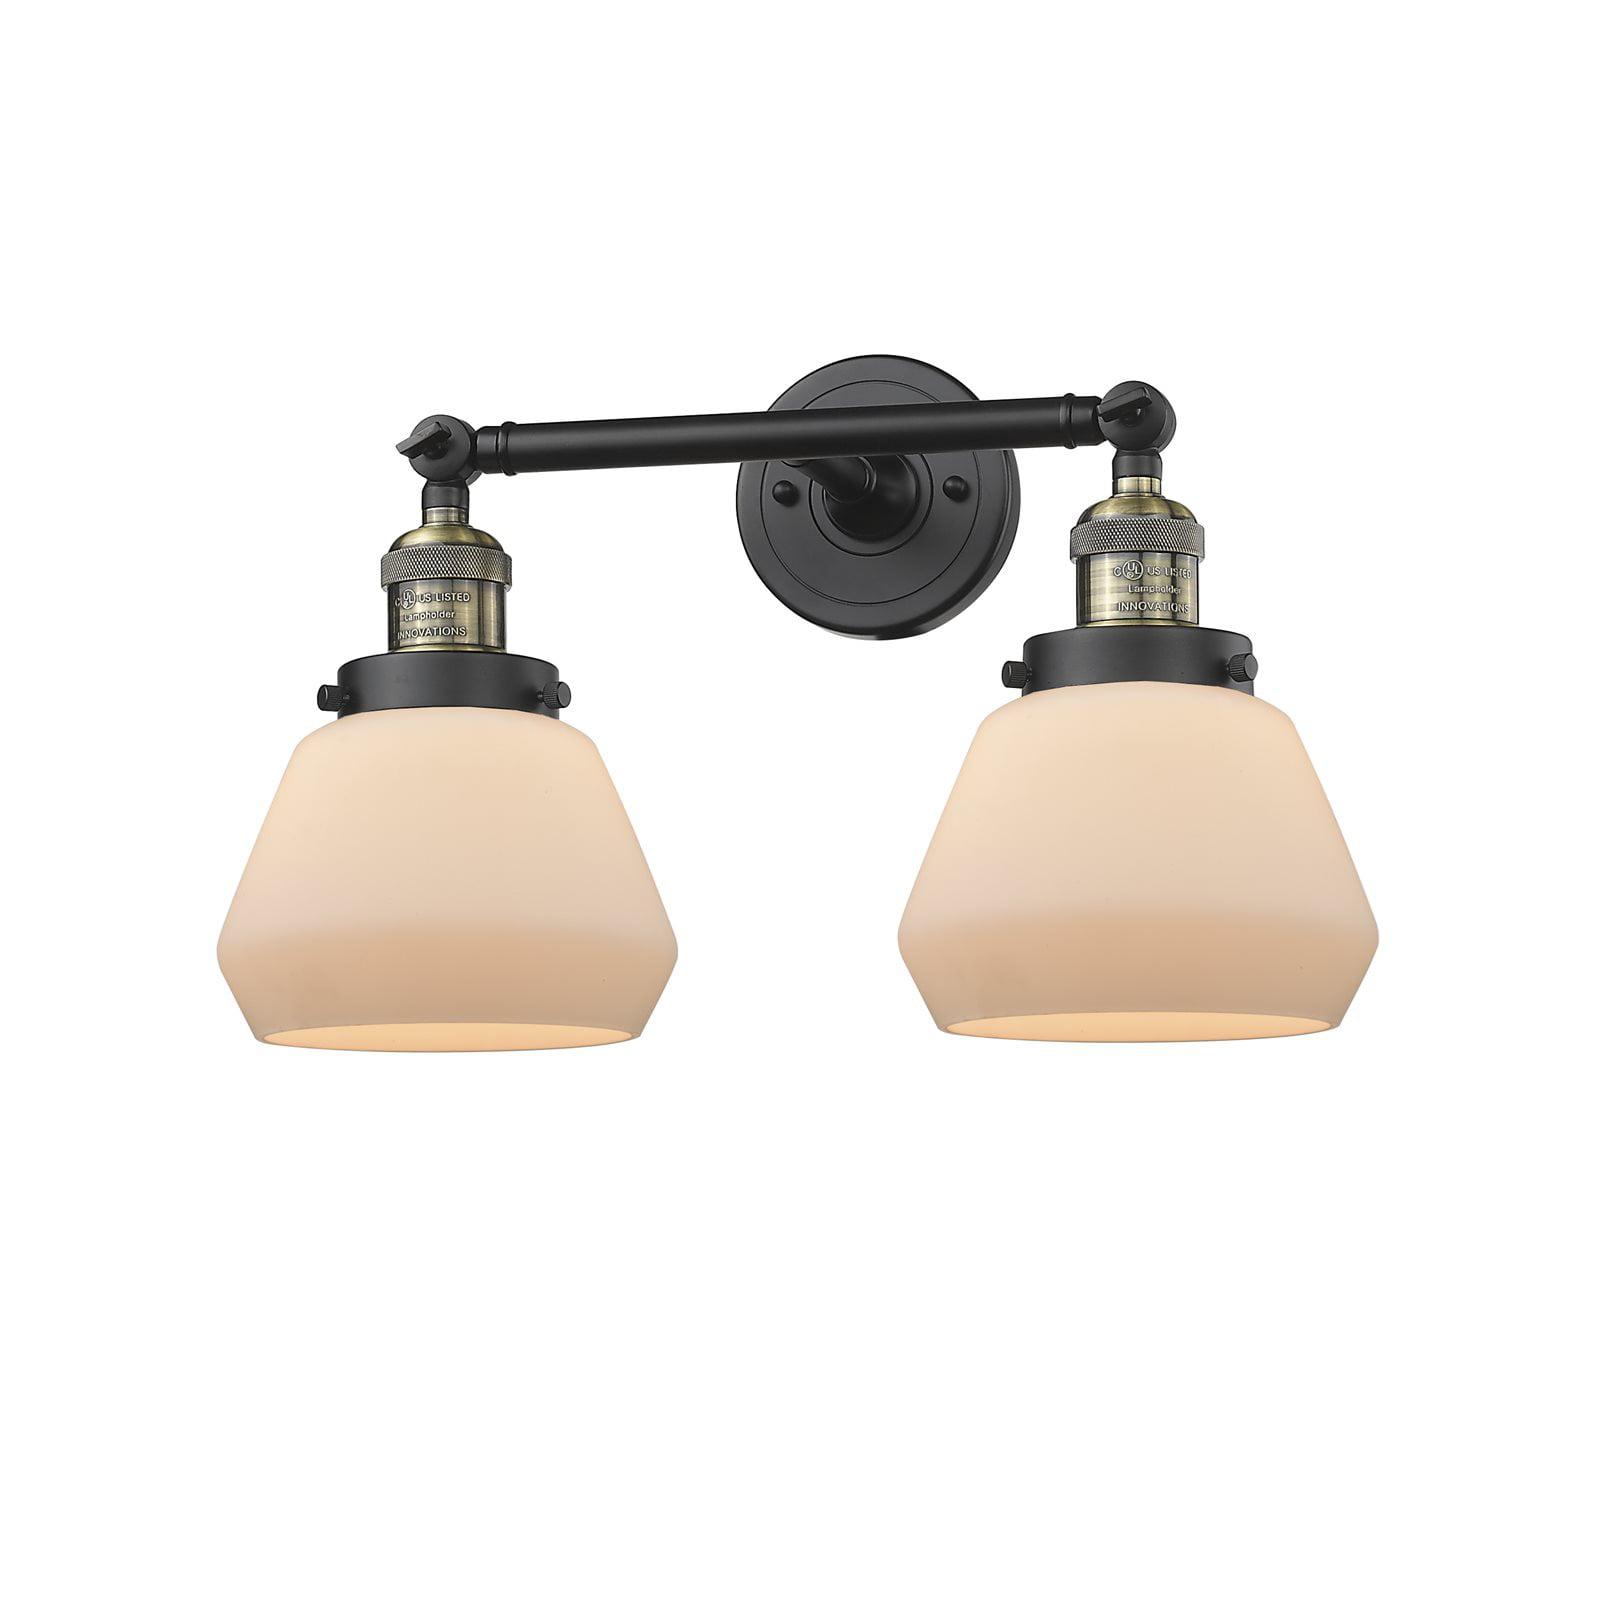 "Innovations 2-LT LED Fulton 16.5"" Bathroom Fixture Black Antique Brass 208-BAB-G171-LED by"